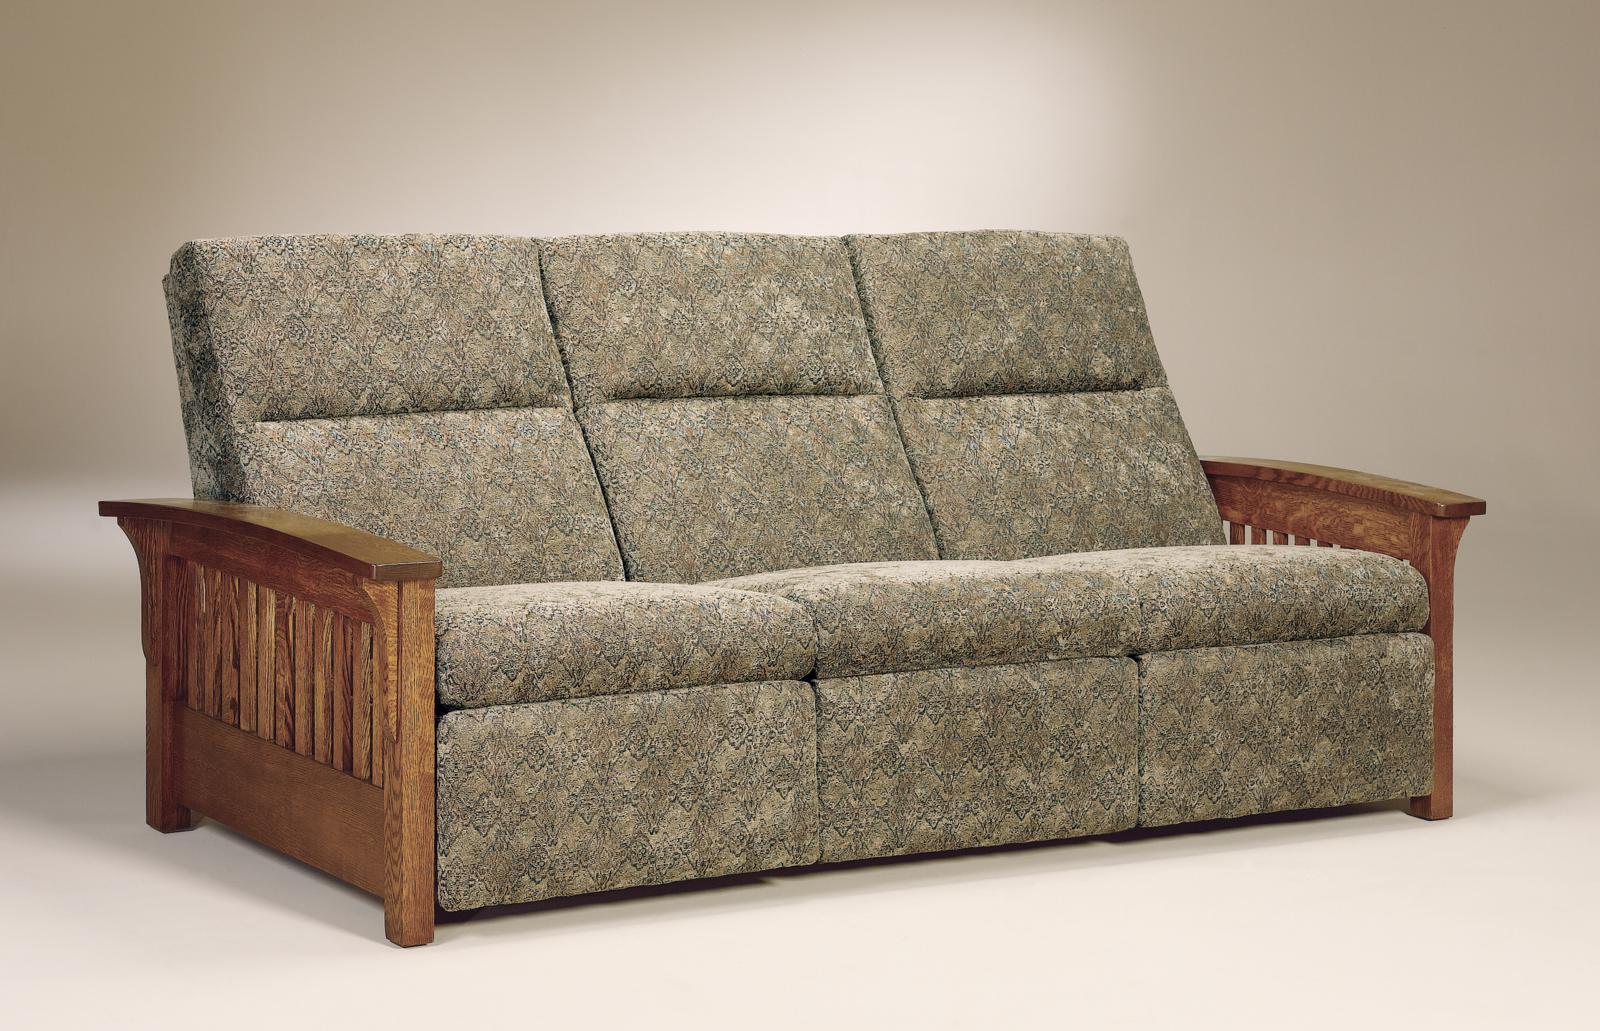 Chelsea Home Furniture 429176sabbott Reclining Fabric Sofa Appliances Connection